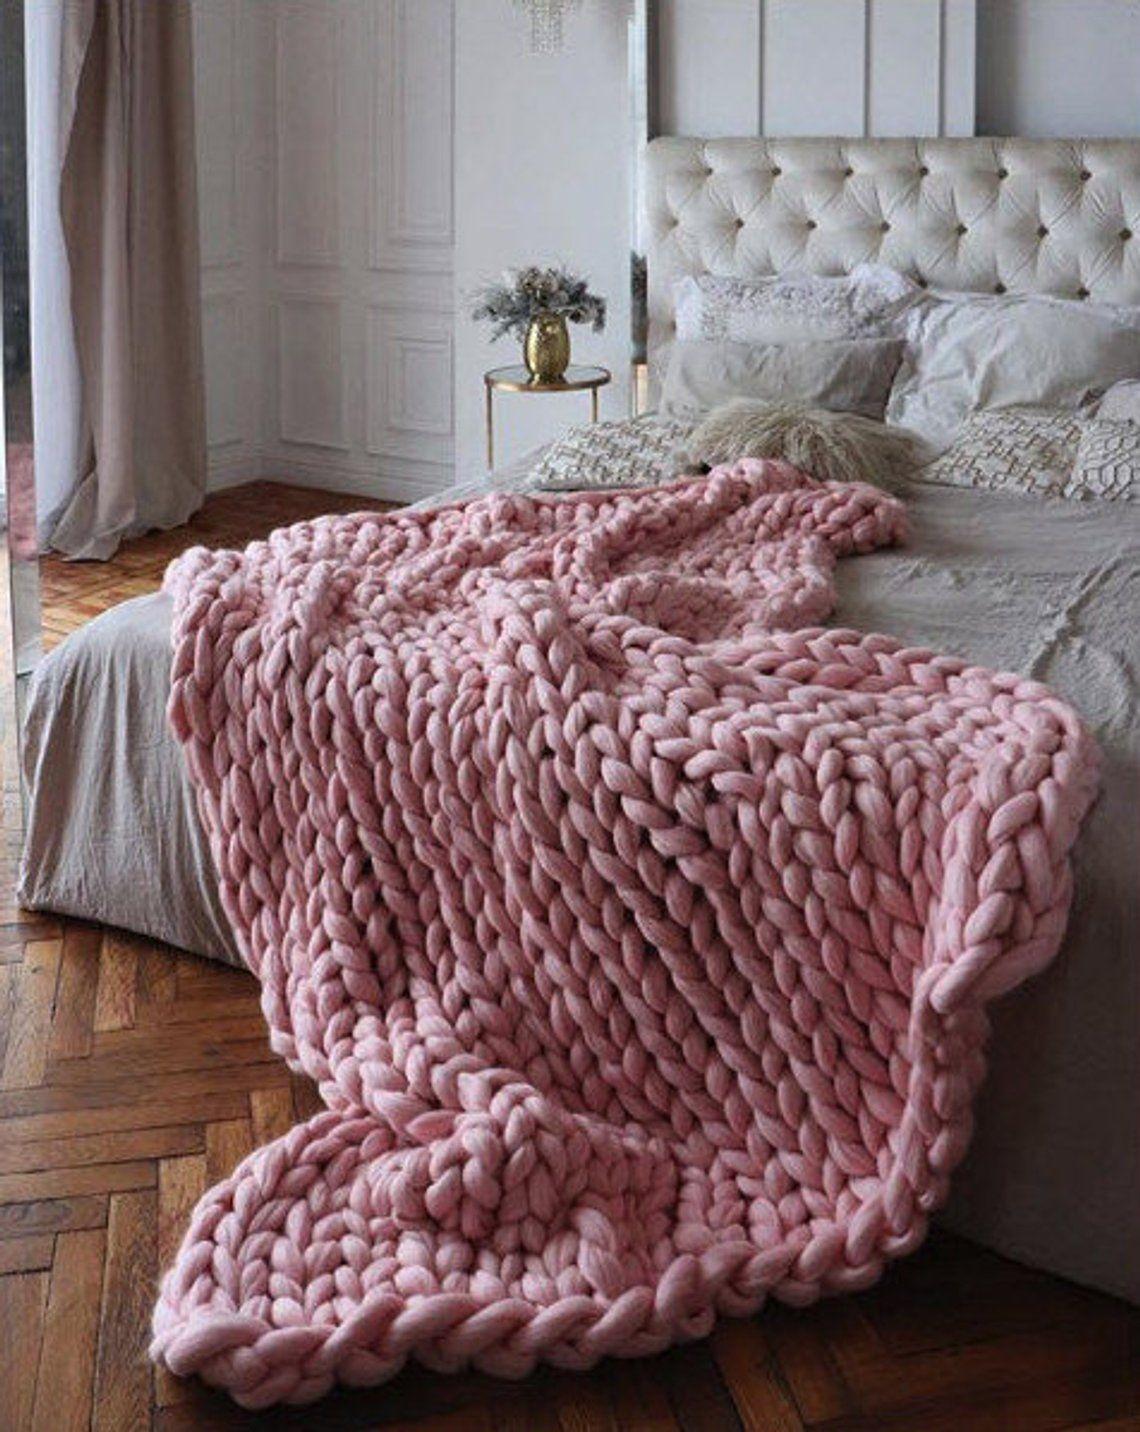 Chunky Knit Merino Wool Blanket Wool Blanket Queen Wool Etsy Big Yarn Blanket Big Knit Blanket Knitted Blankets